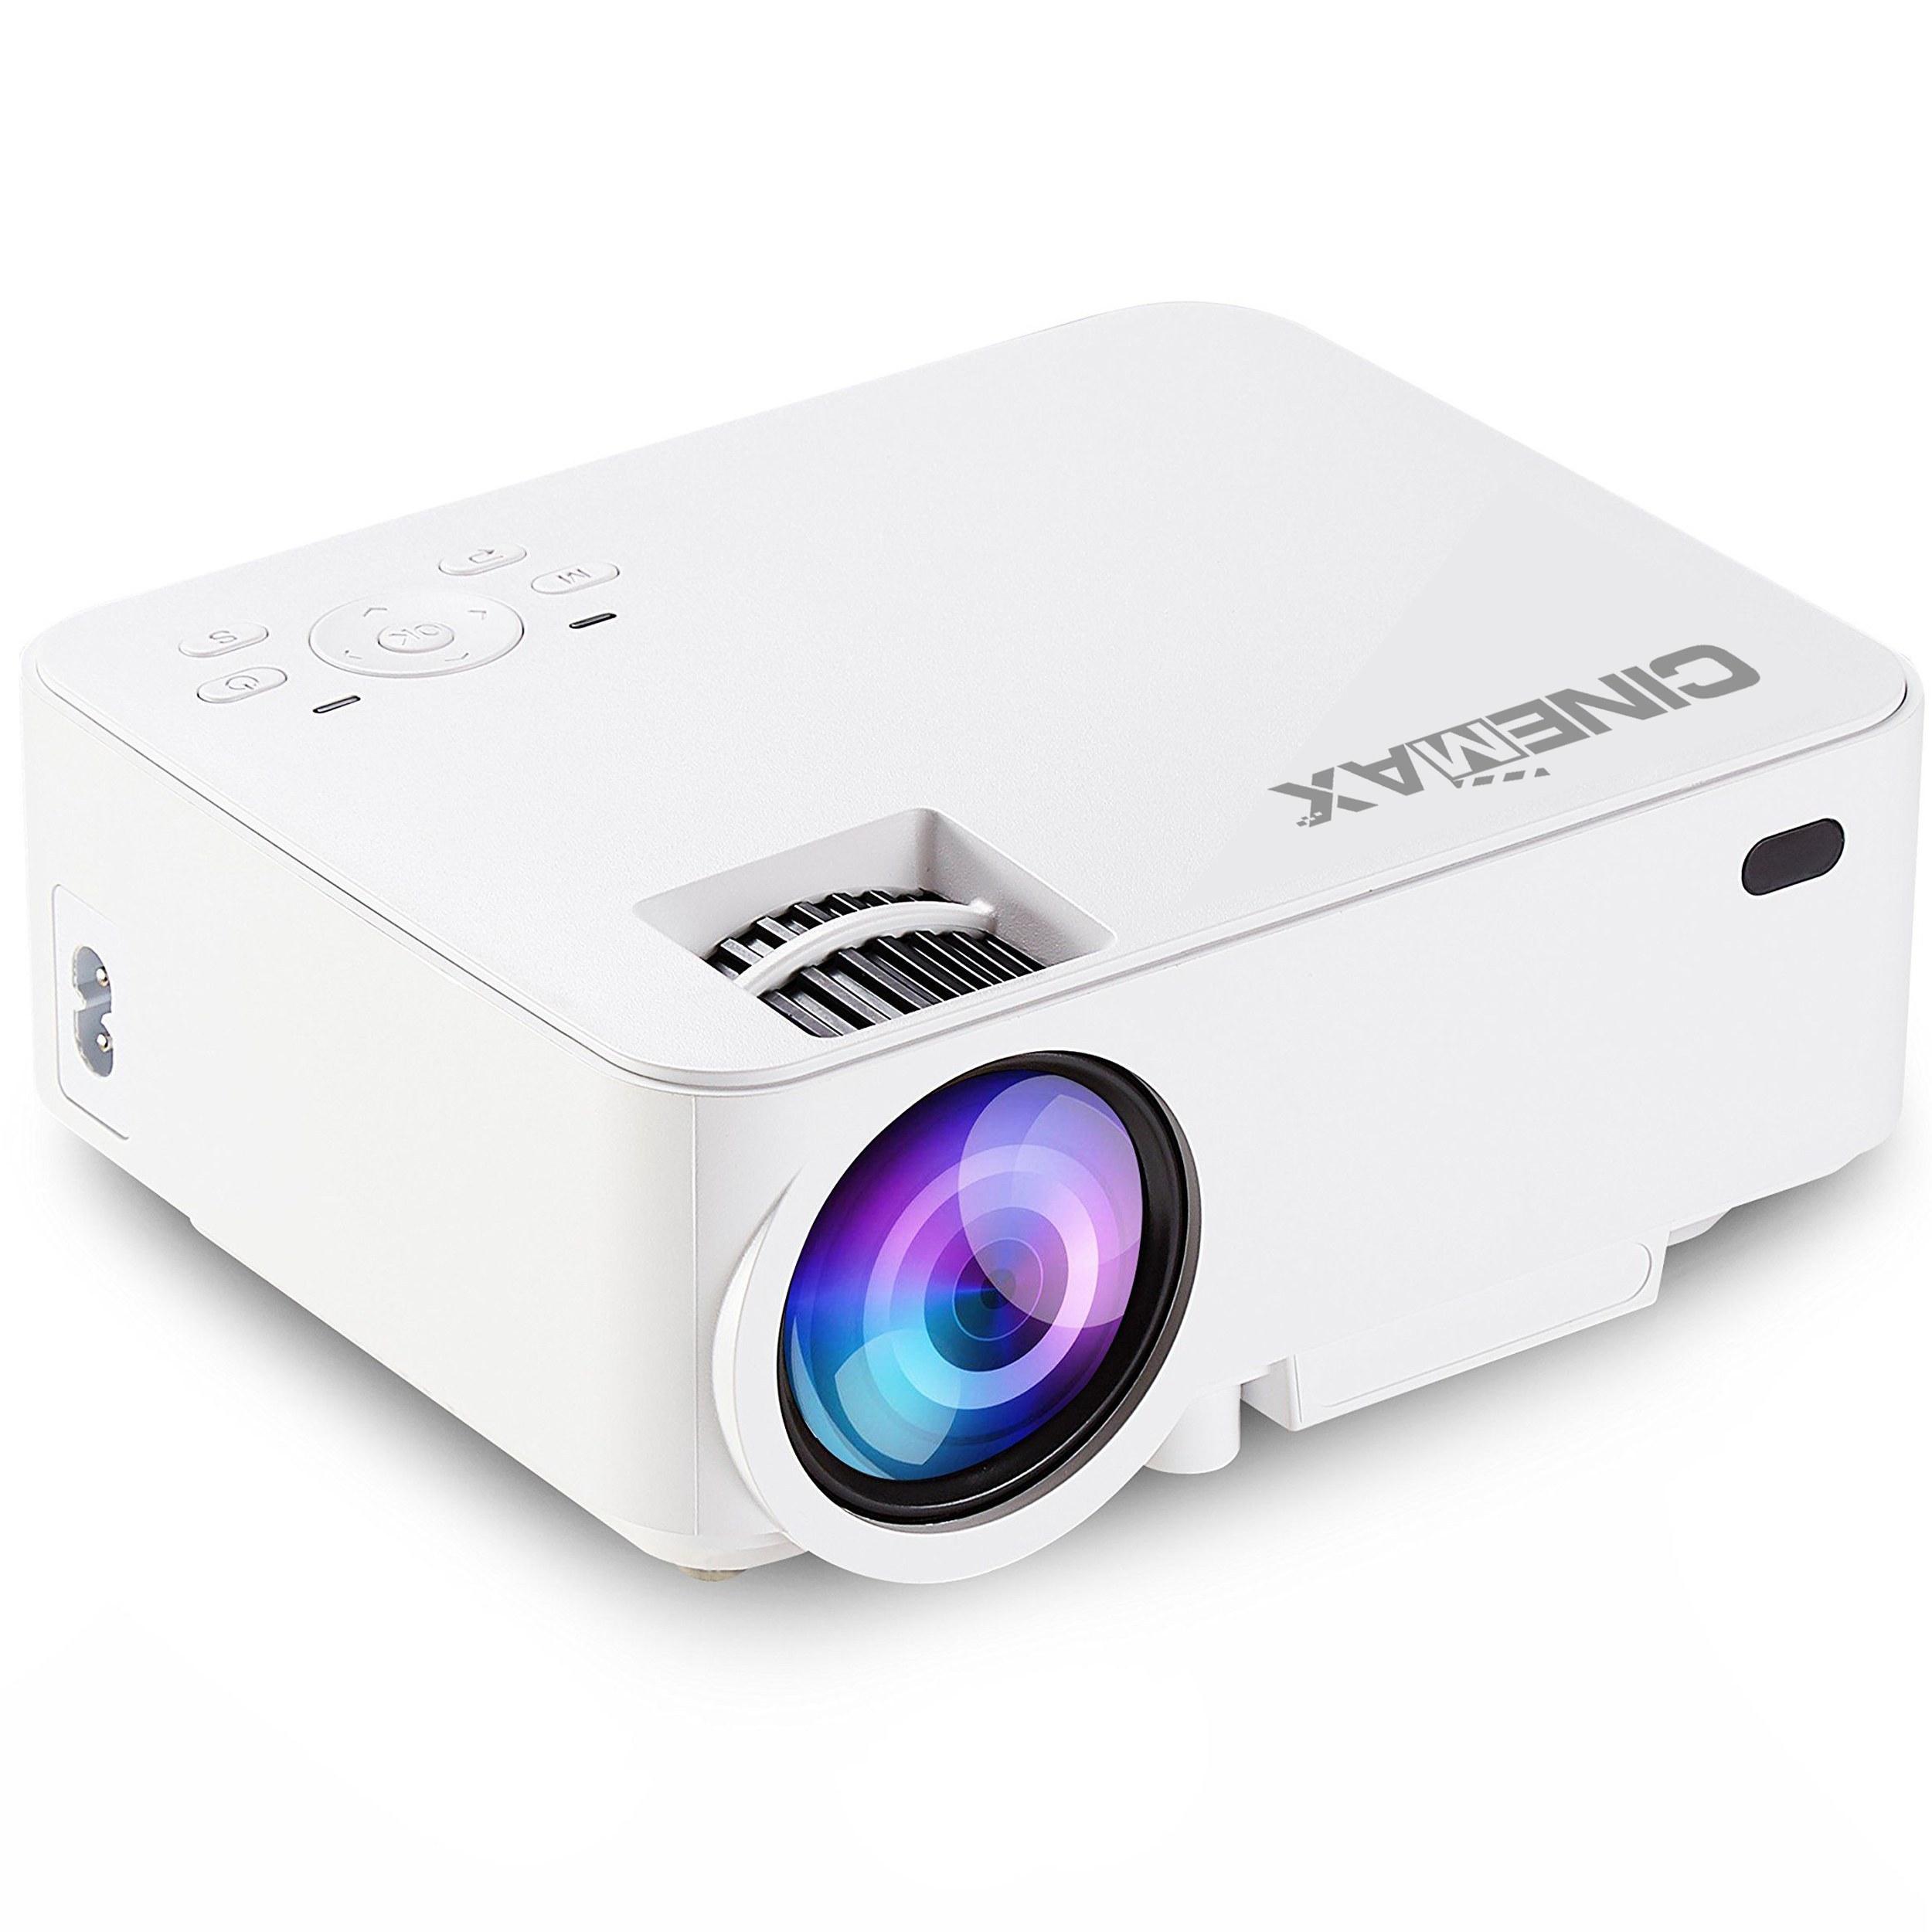 تصویر دیتا ویدیو پروژکتور سینمکس مدل CINEMAX T20 CINEMAX T20 Data Video Projector